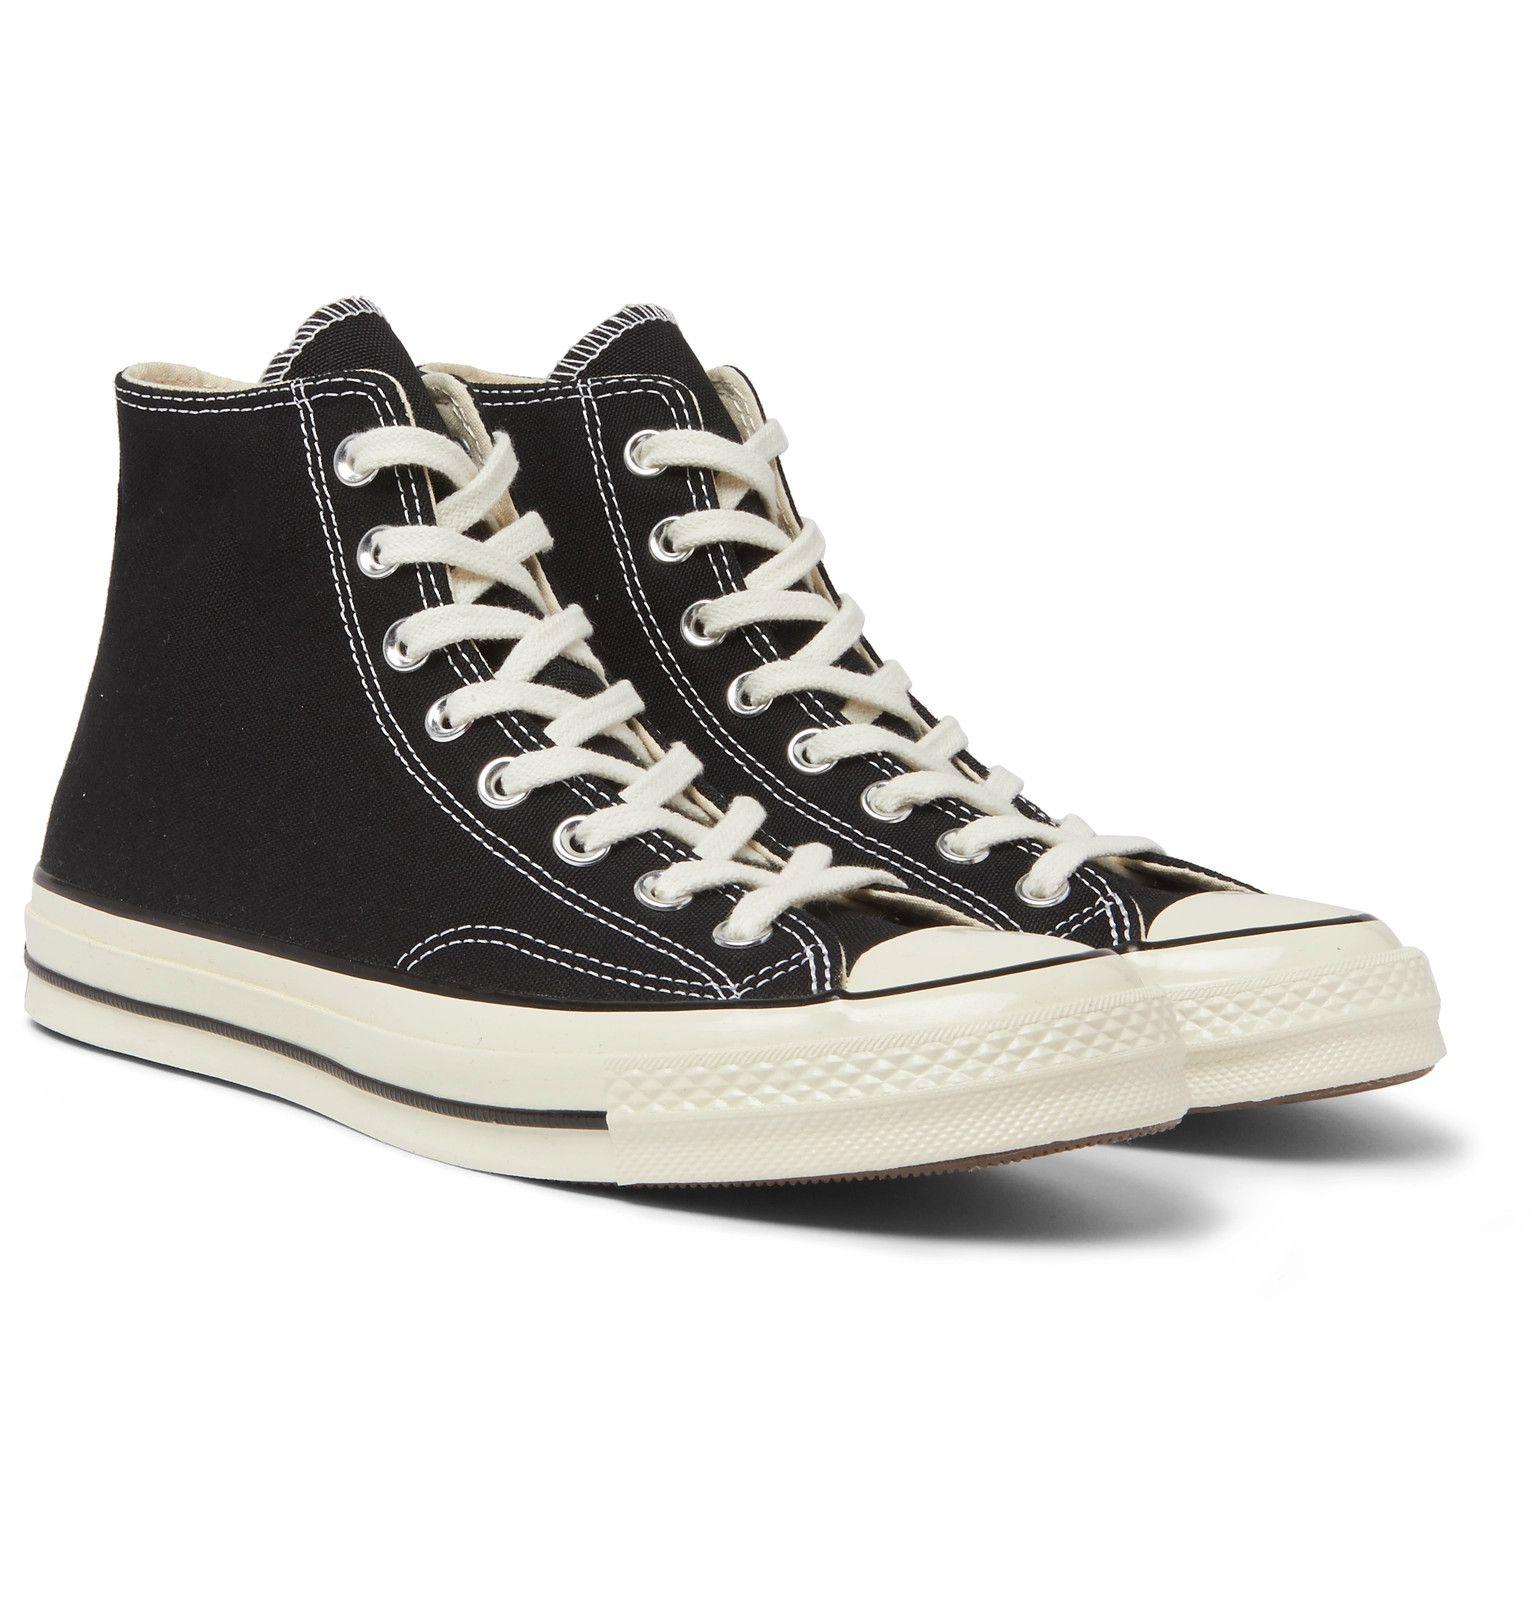 Black Chuck 70 Canvas High-Top Sneakers